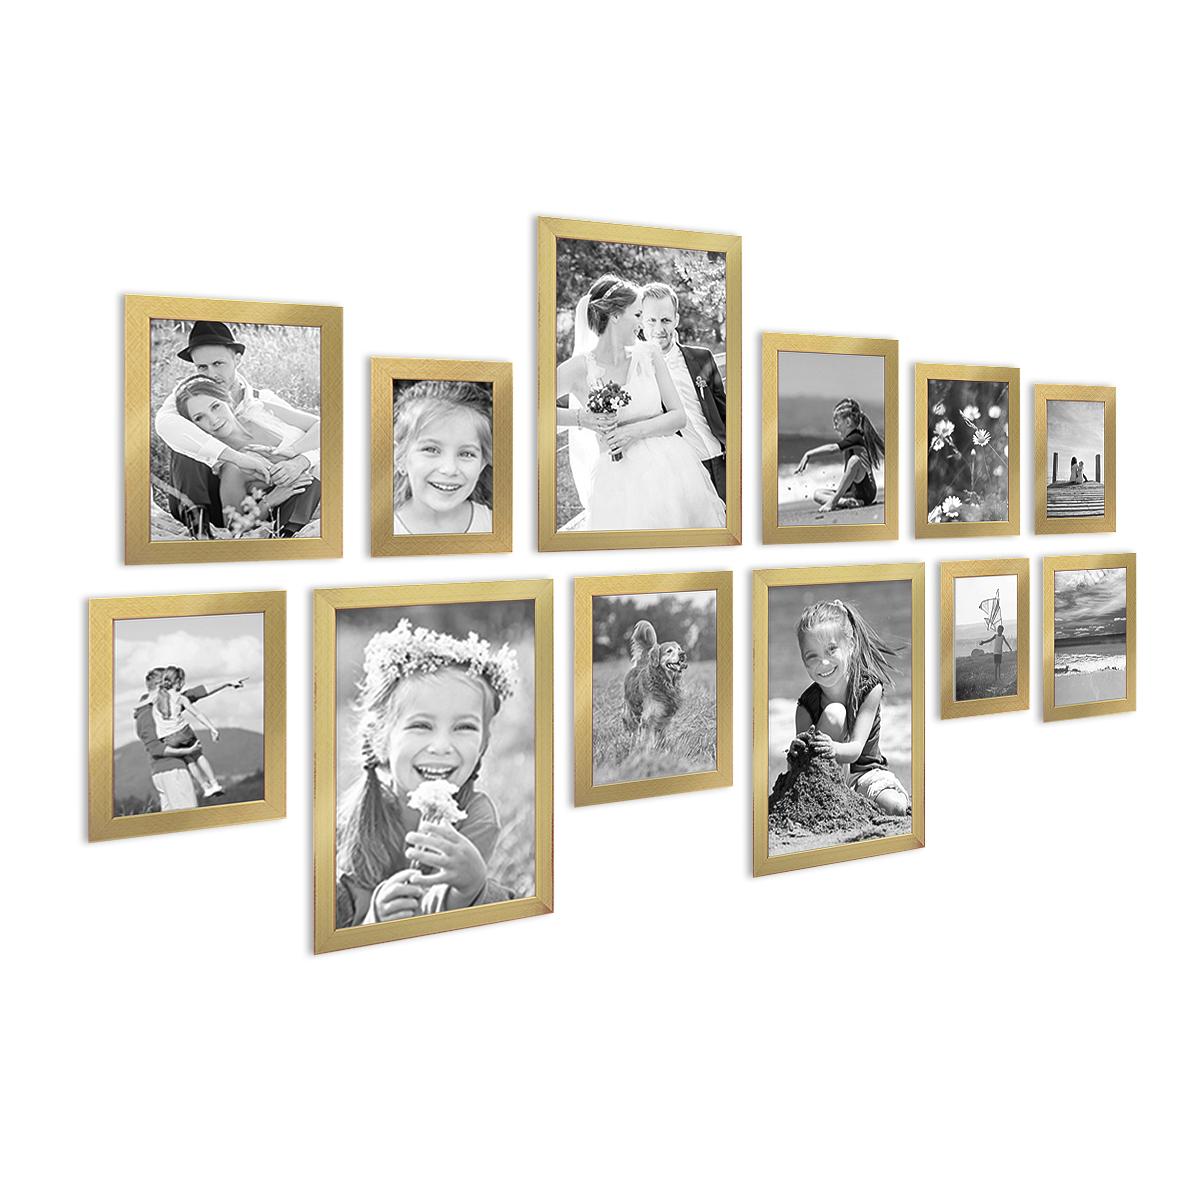 12er set bilderrahmen modern gold massivholz 10x15 bis 20x30 cm inklusive zubeh r fotorahmen. Black Bedroom Furniture Sets. Home Design Ideas